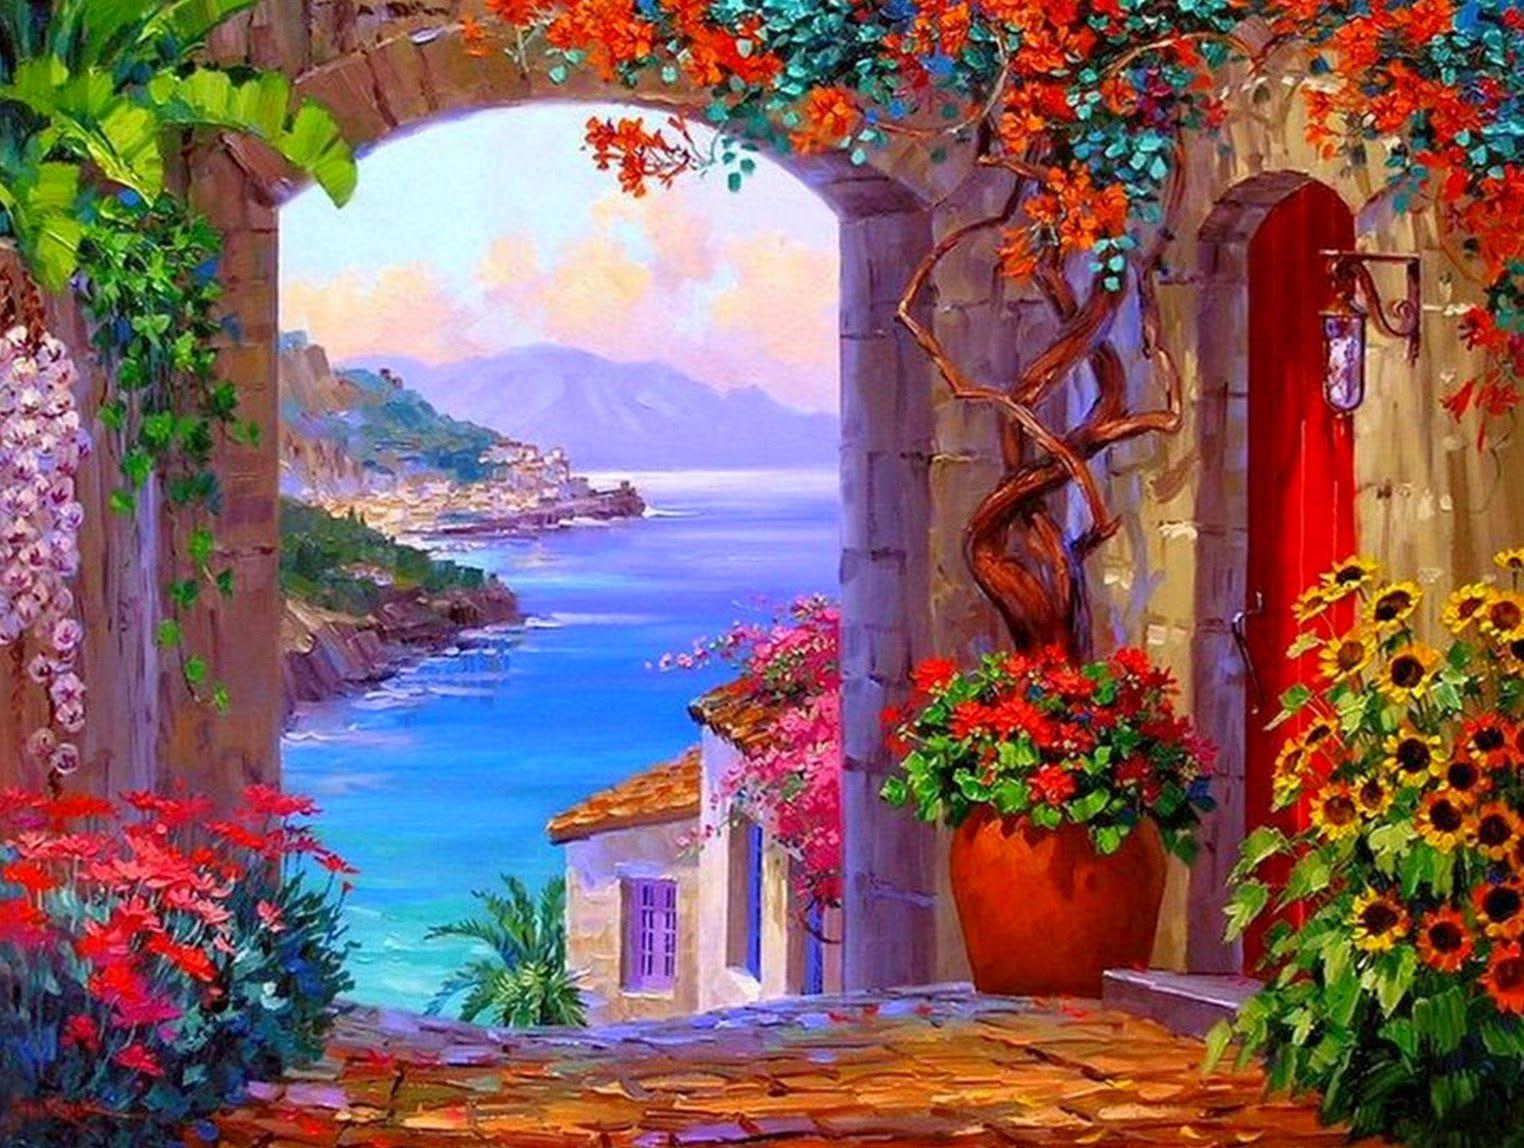 Cuadros de paisajes de grecia de b squeda grecia - Cuadros espectaculares modernos ...